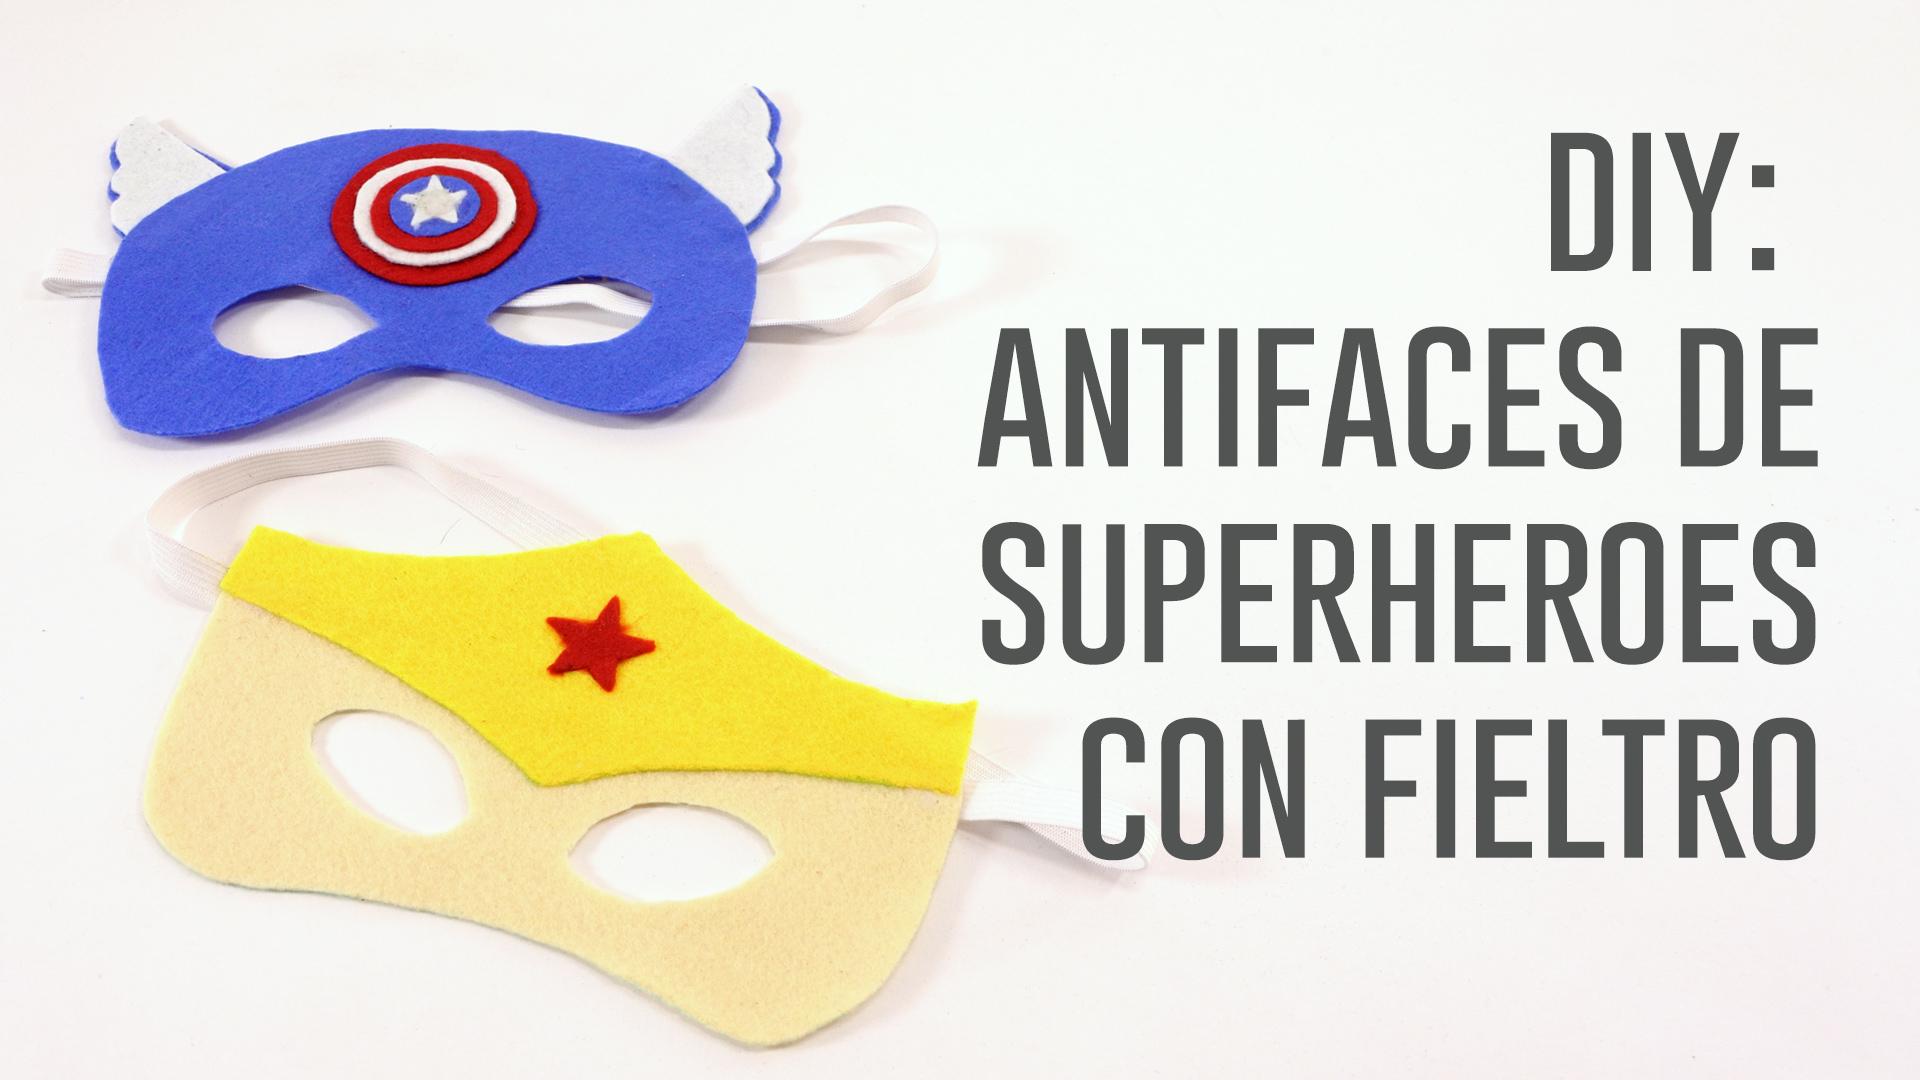 ANTIFAZ SUPERHEROE FIELTRO.Imagen fija001